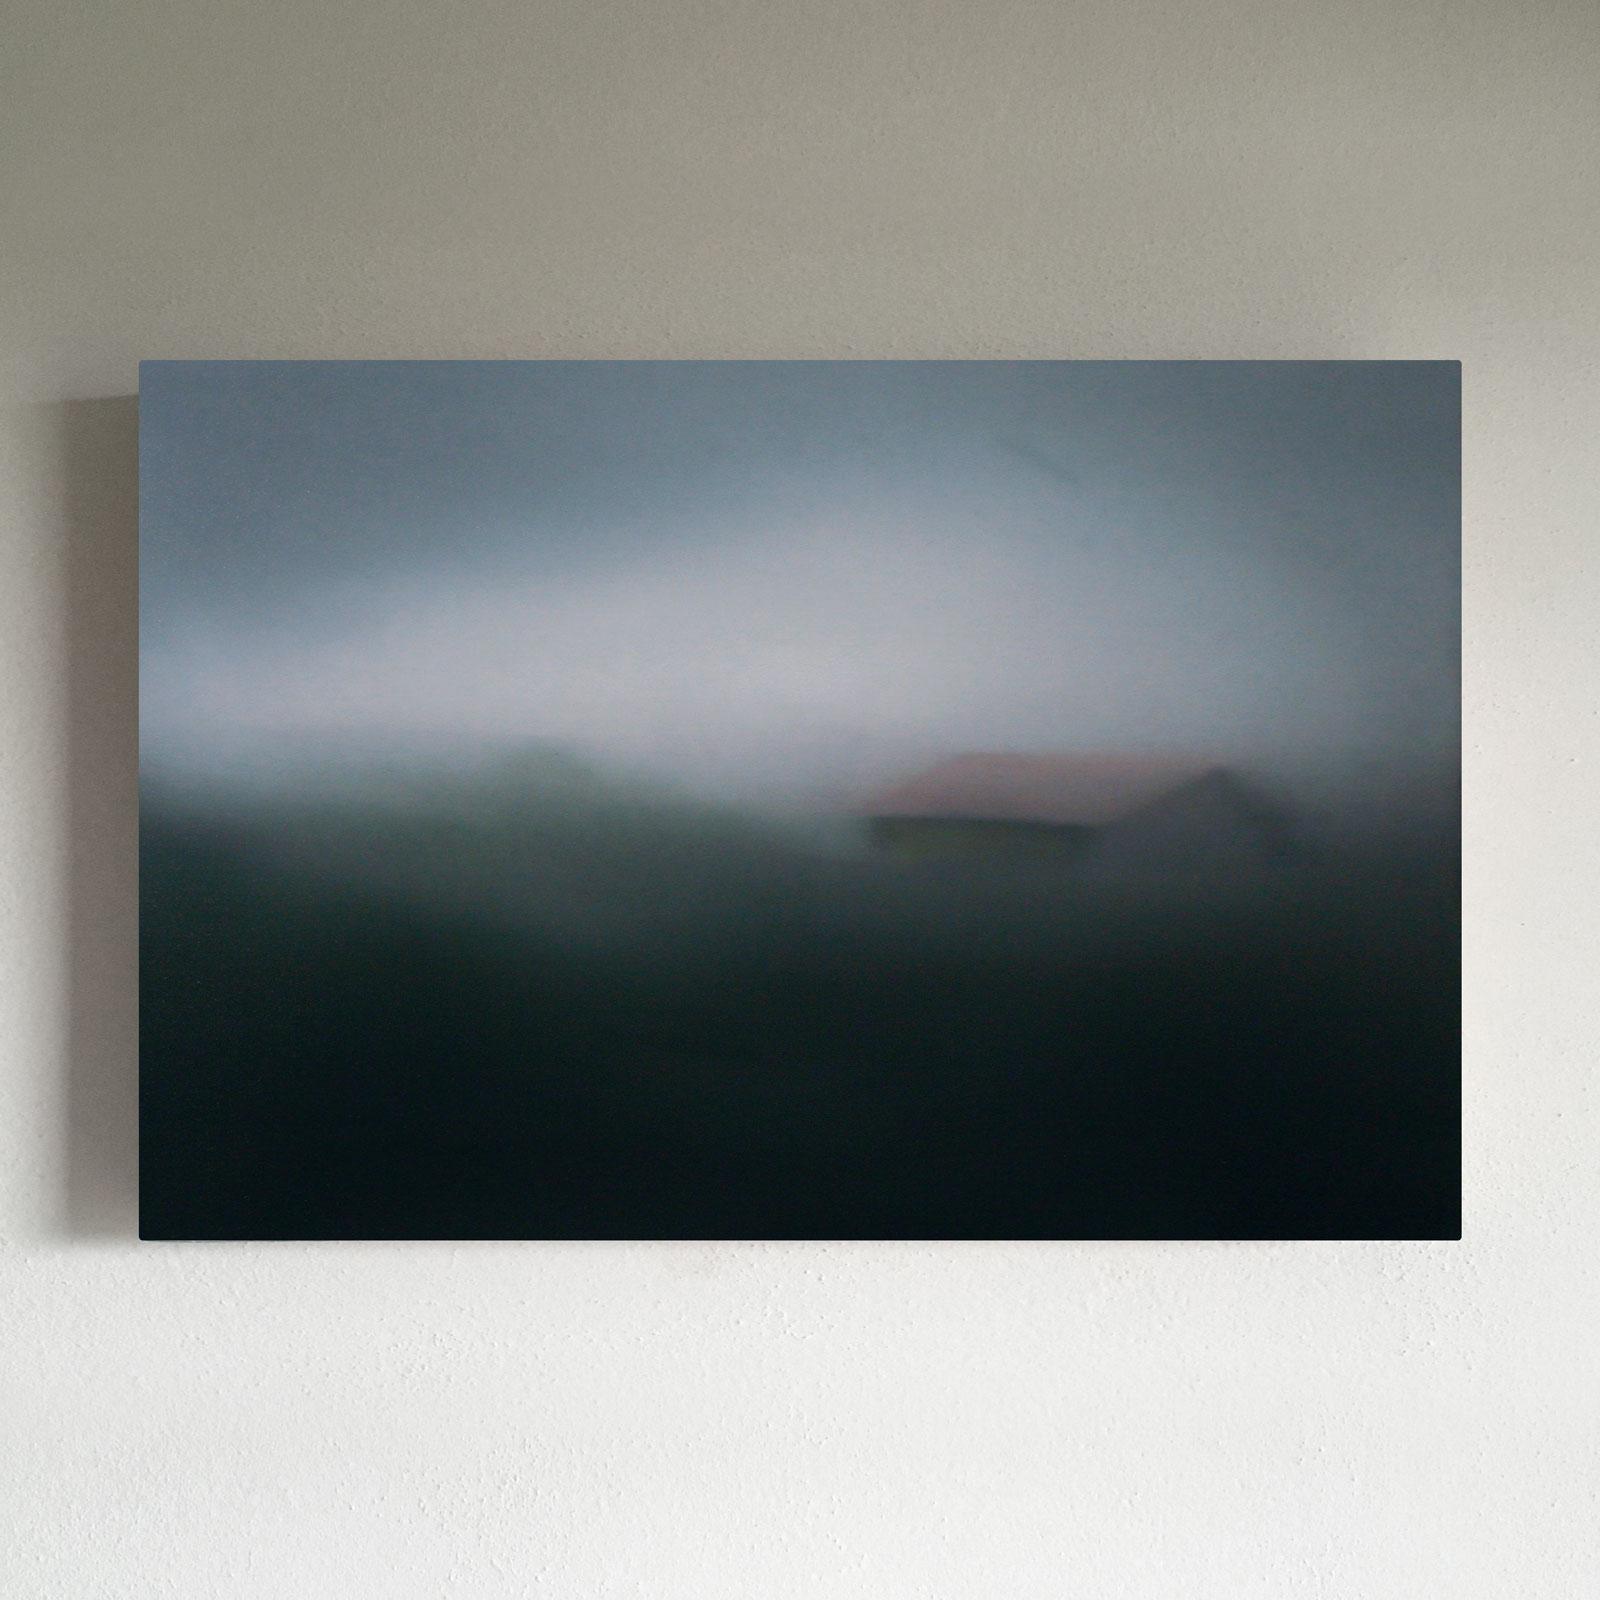 T#14-2009, oil on canvas, 80x120cm, priv. coll.